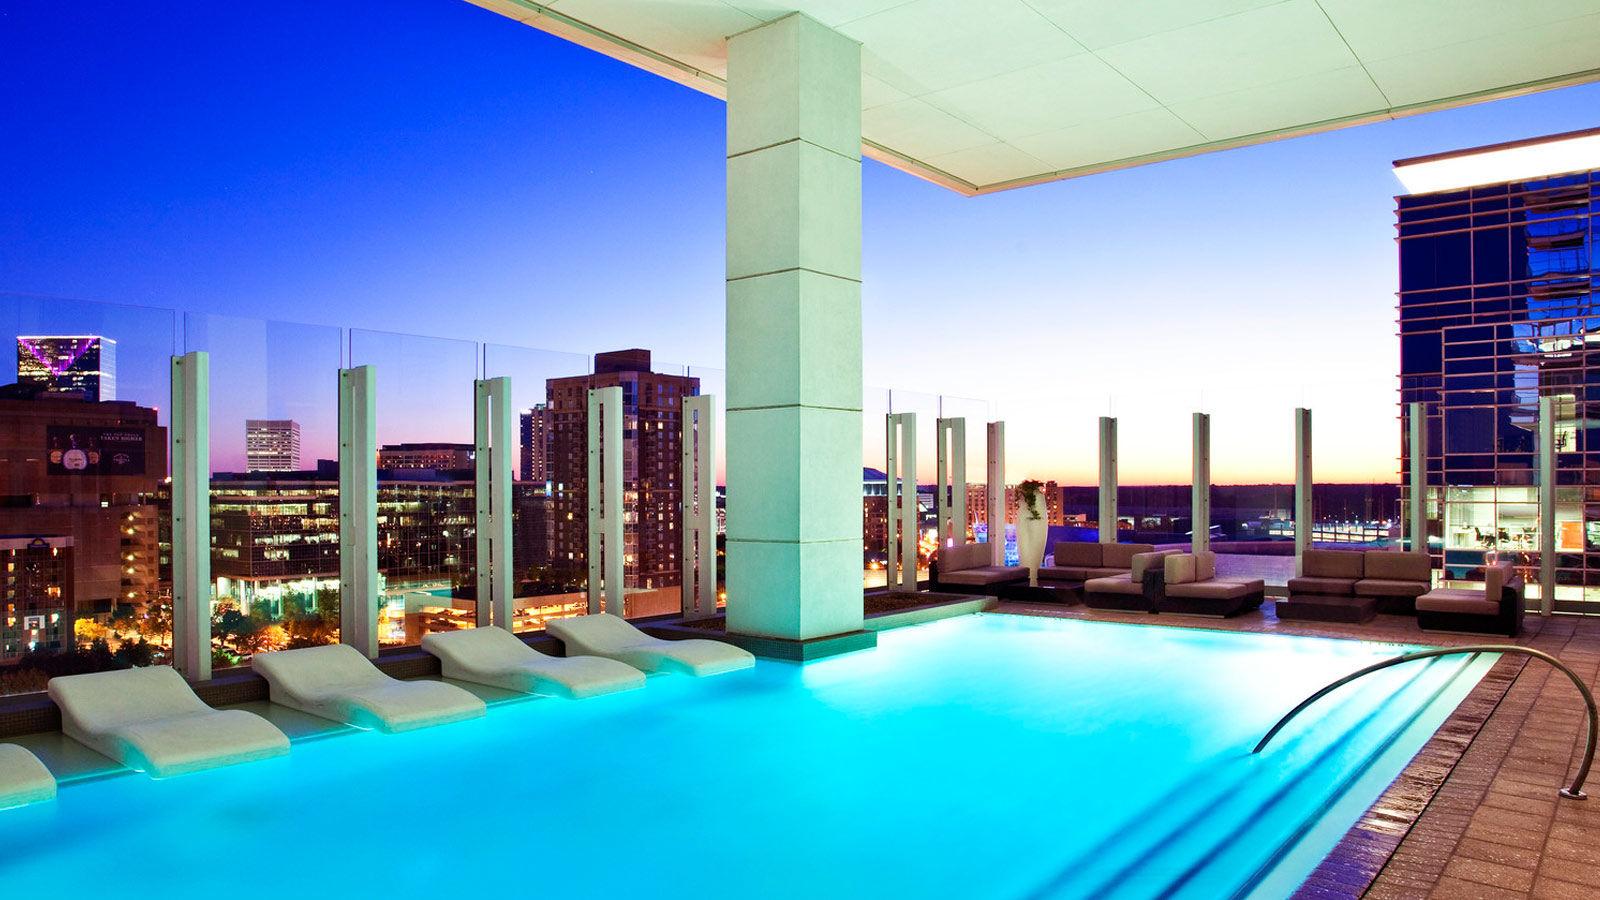 Five Atlanta Rooftop Bars With Stunning Views